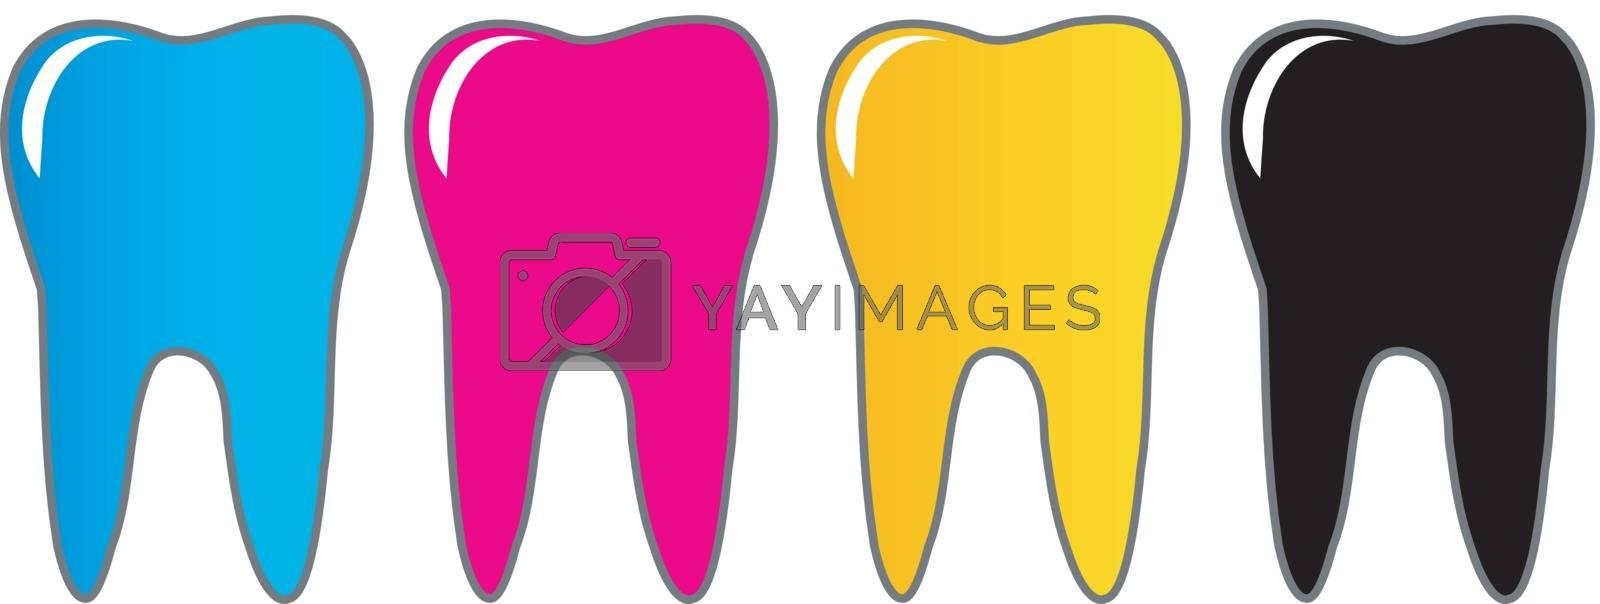 CMYK tooth logo for dentist